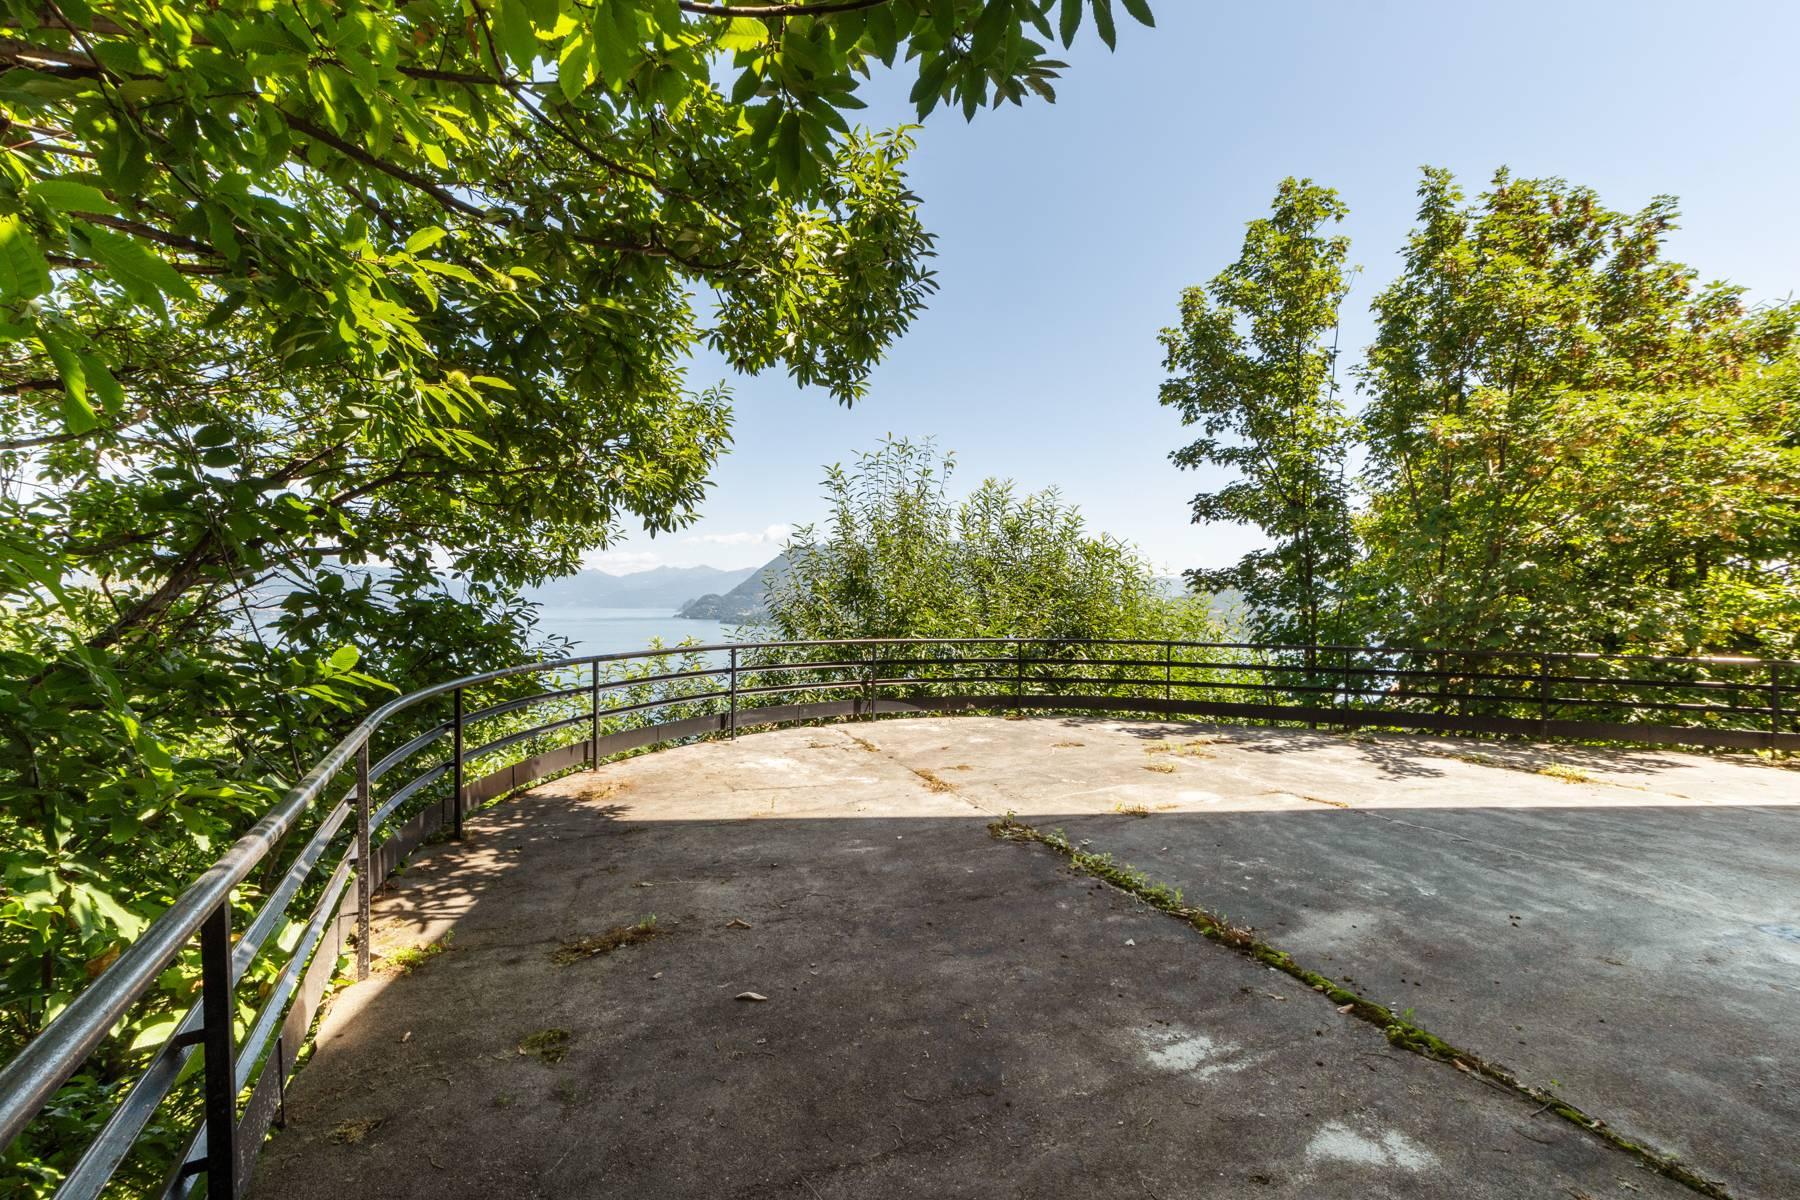 Villa in Vendita a Stresa: 5 locali, 150 mq - Foto 1